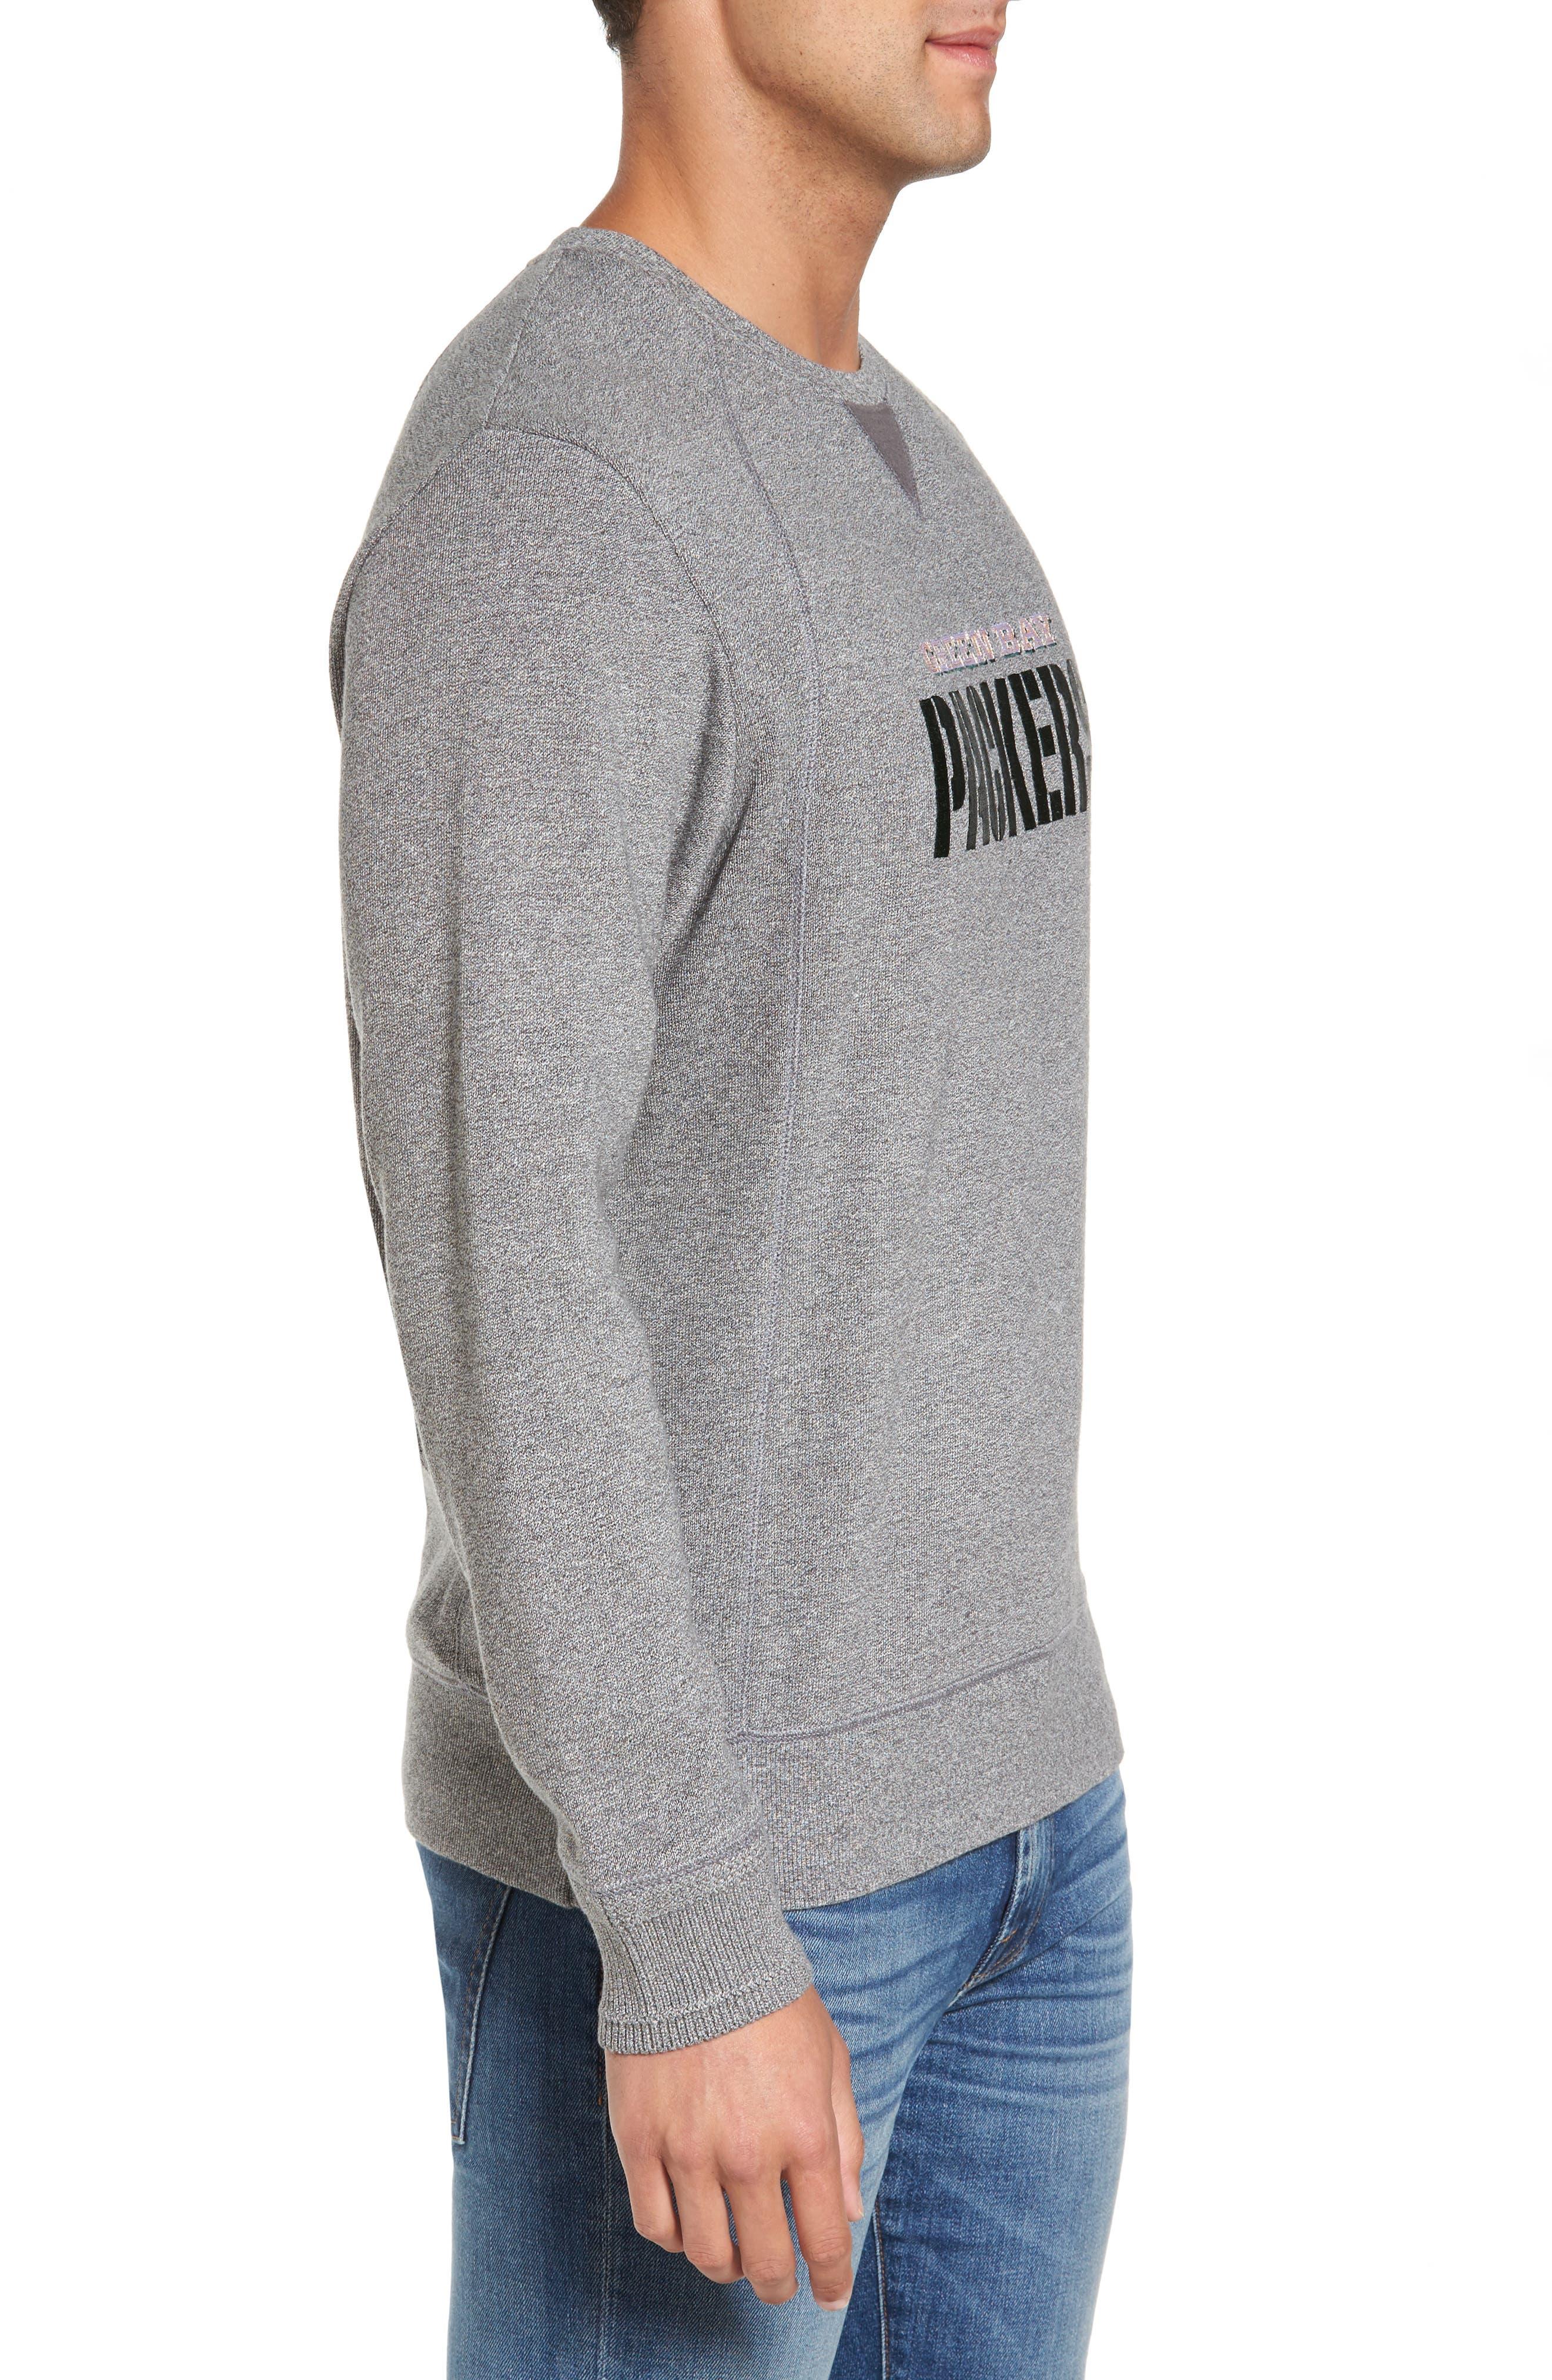 NFL Stitch of Liberty Embroidered Crewneck Sweatshirt,                             Alternate thumbnail 82, color,